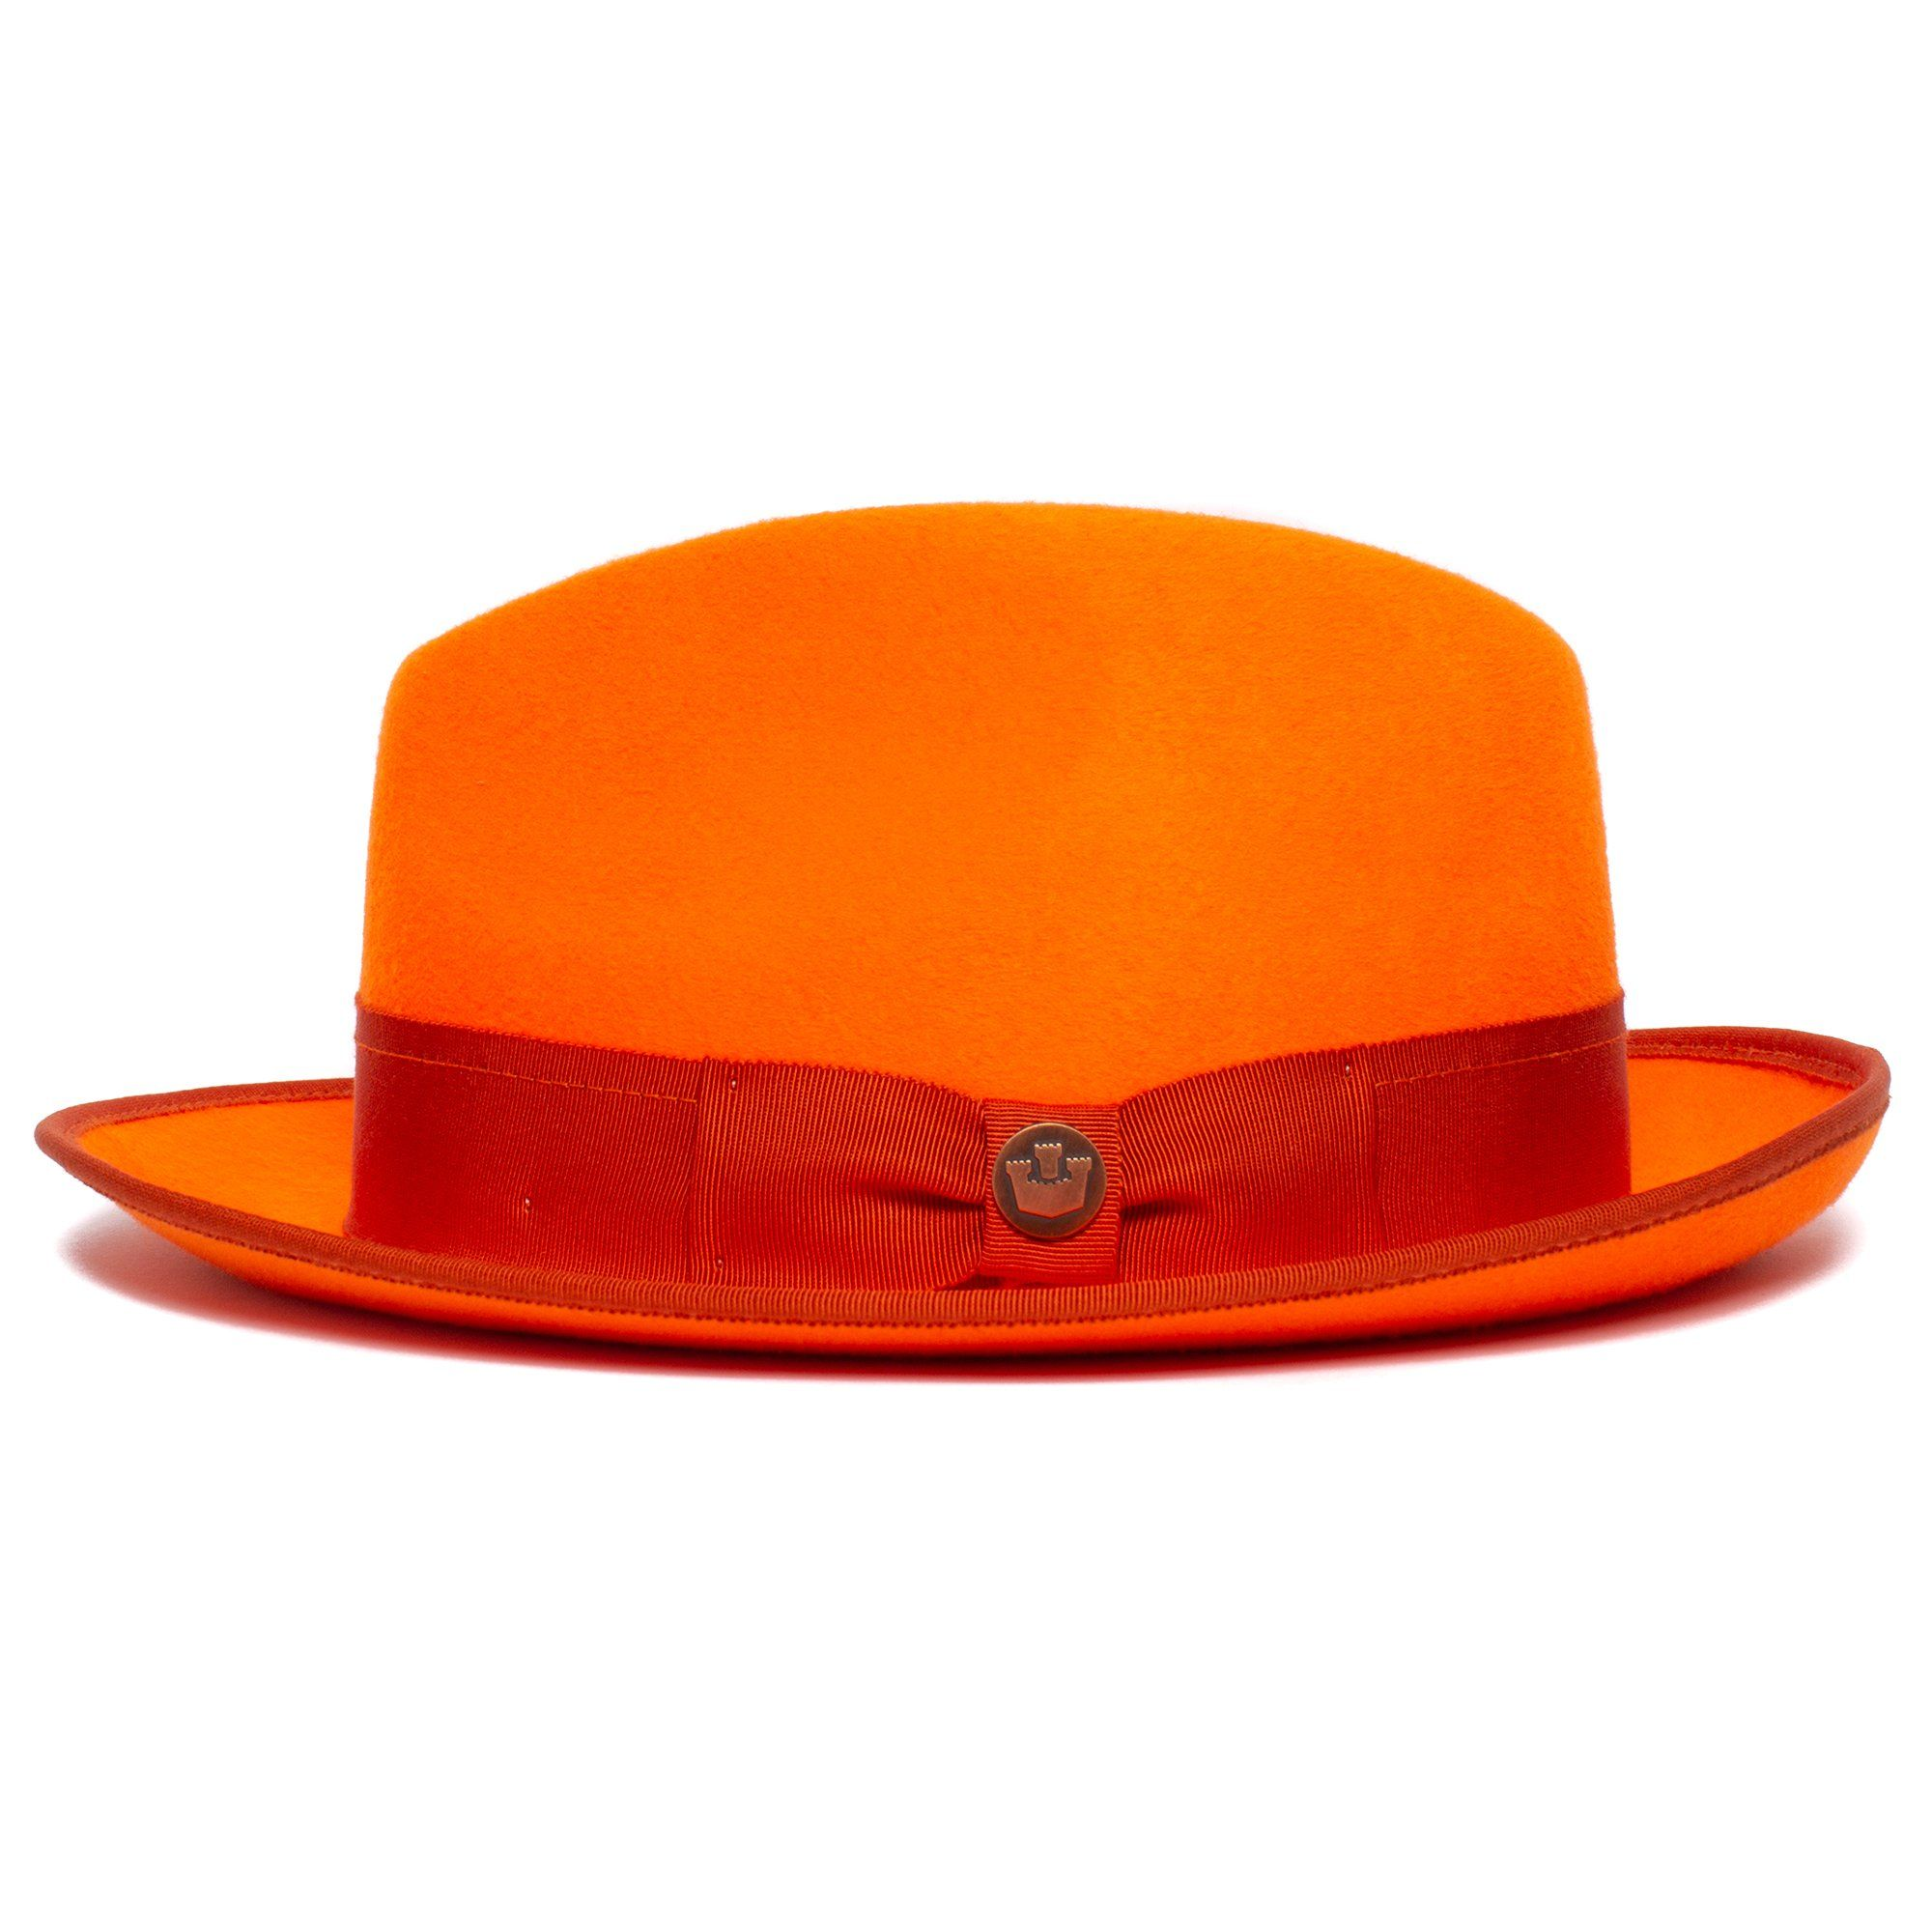 The Sherbinski Fedora Goorin Fedora Hat